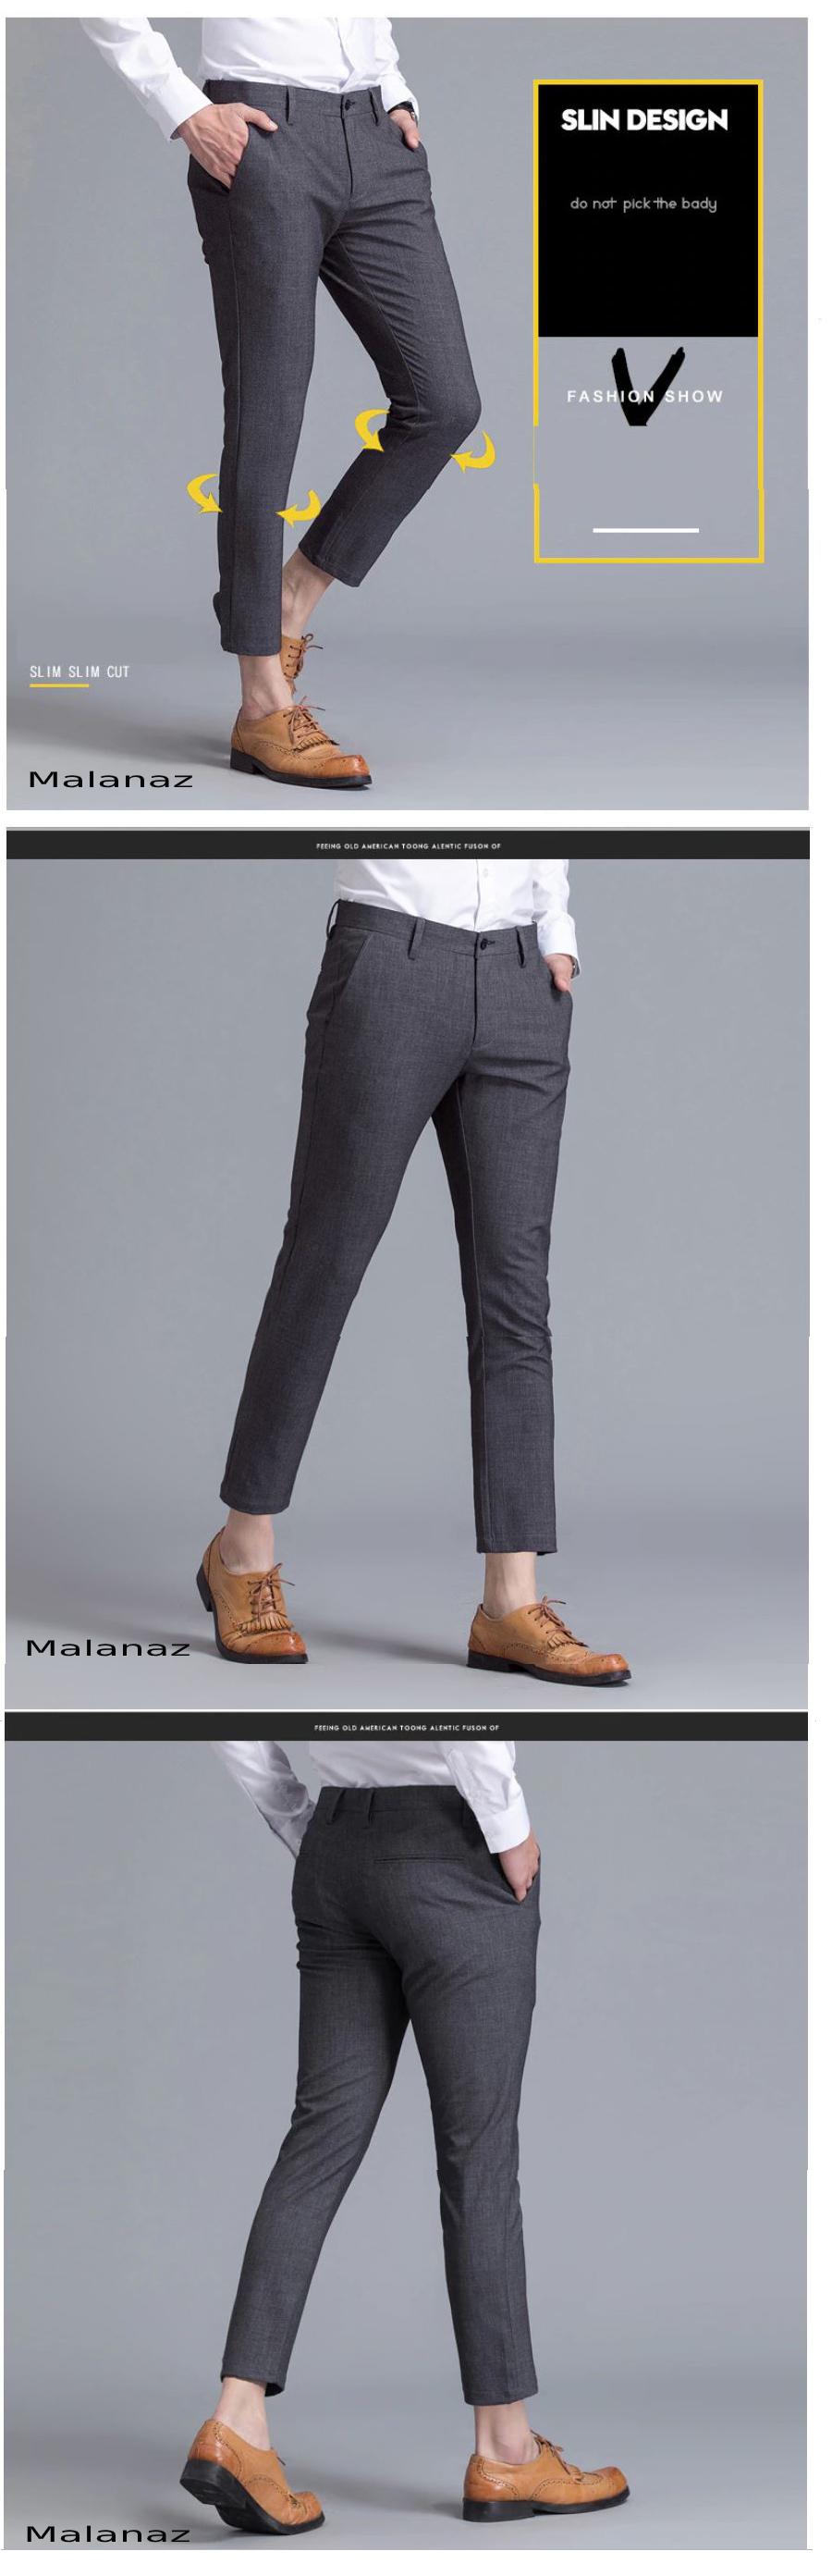 Quần ttaay nam tphcm HL03 - Malanaz Shopping